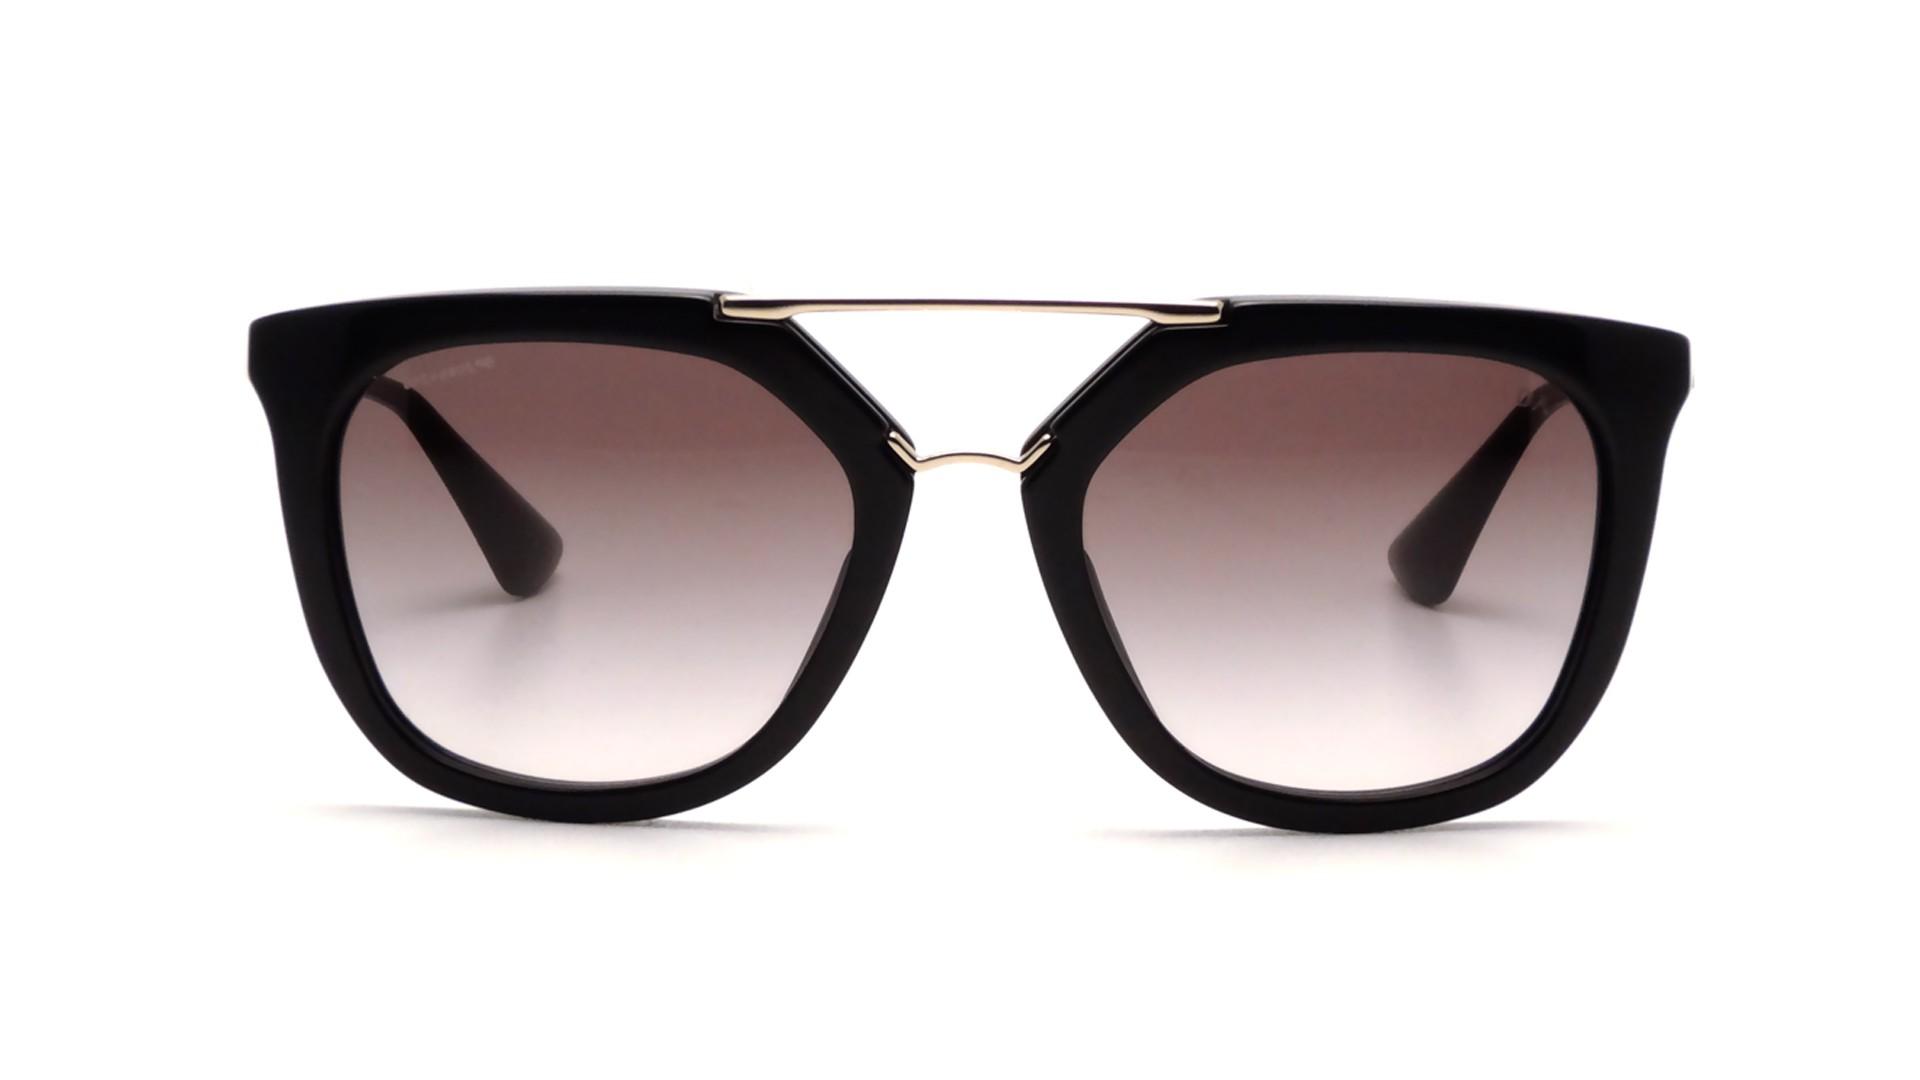 d11b7083710 Sunglasses Prada Cinema Black PR13QS 1AB-0A7 54-20 Medium Gradient